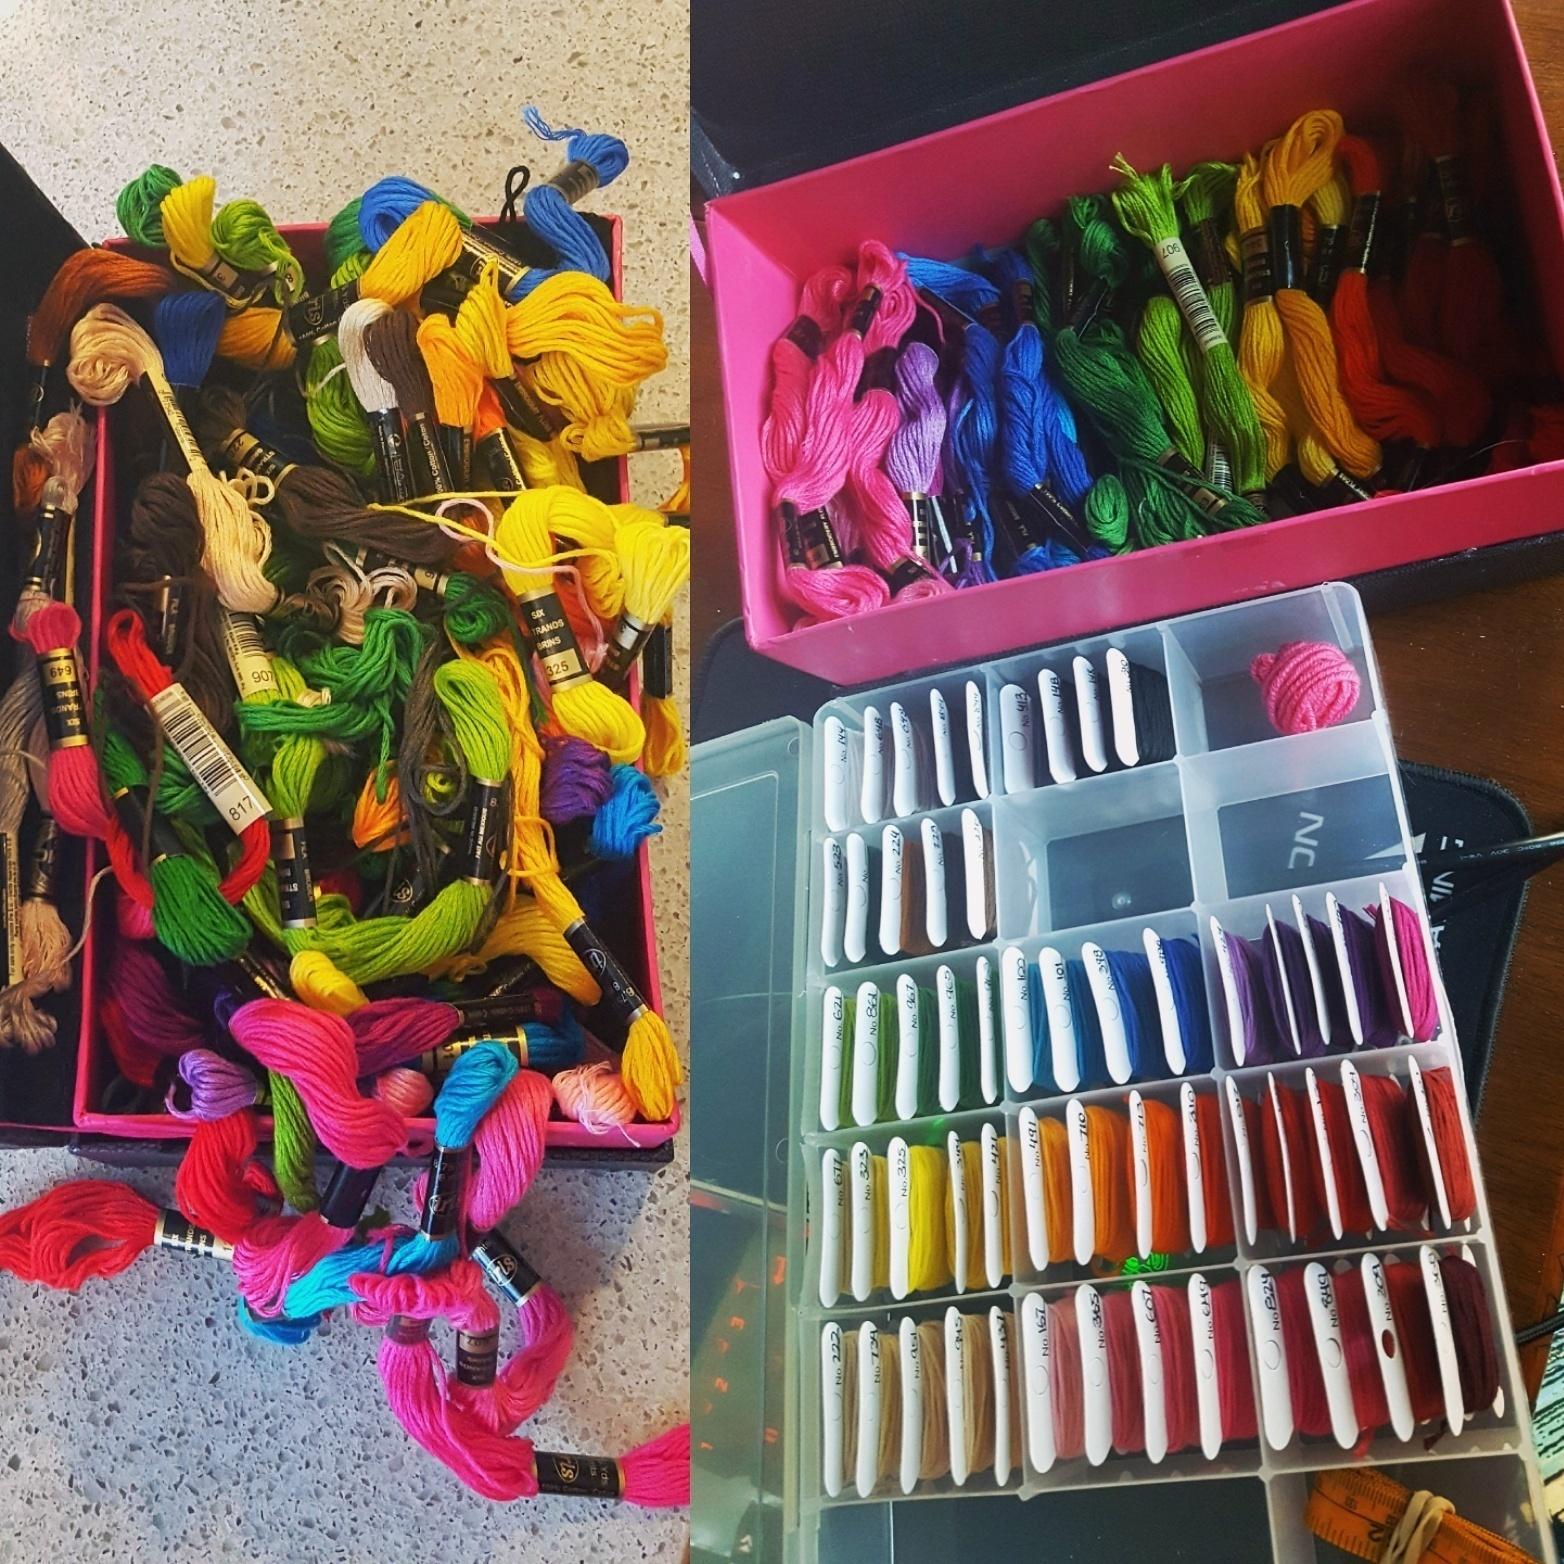 1 - 25 photos of extreme organization will satisfy you